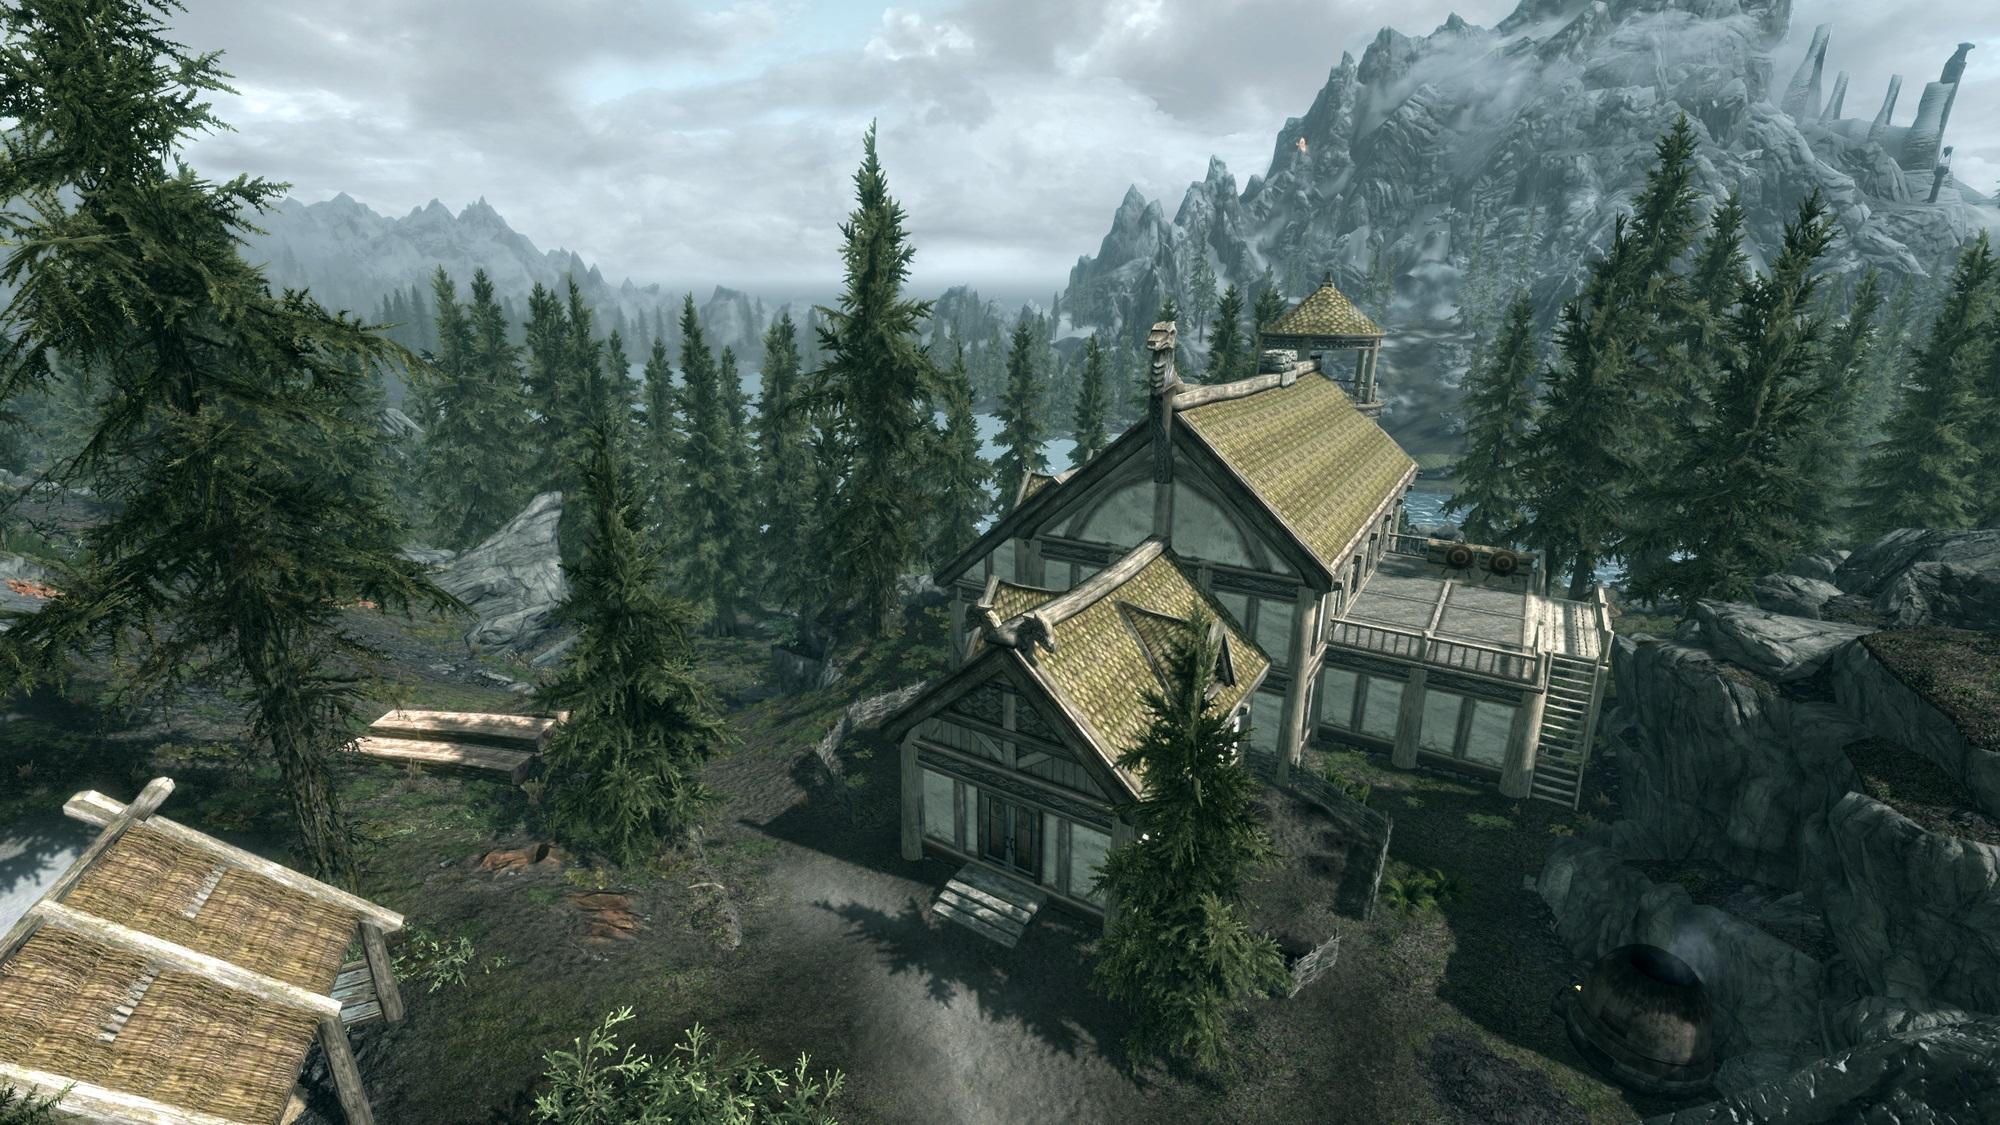 Coming home to video games screenshot